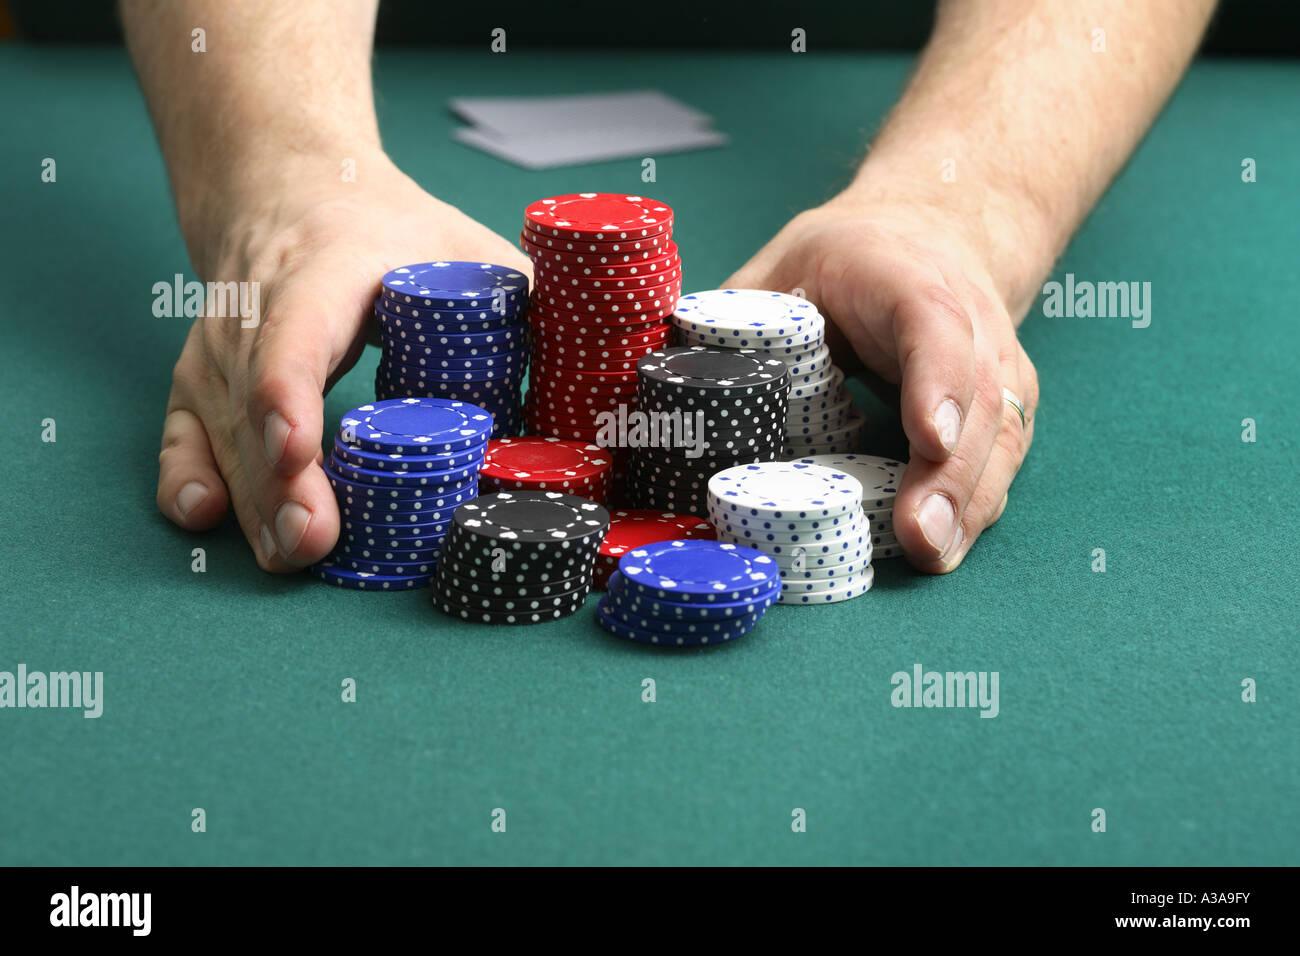 3 bet poker definition